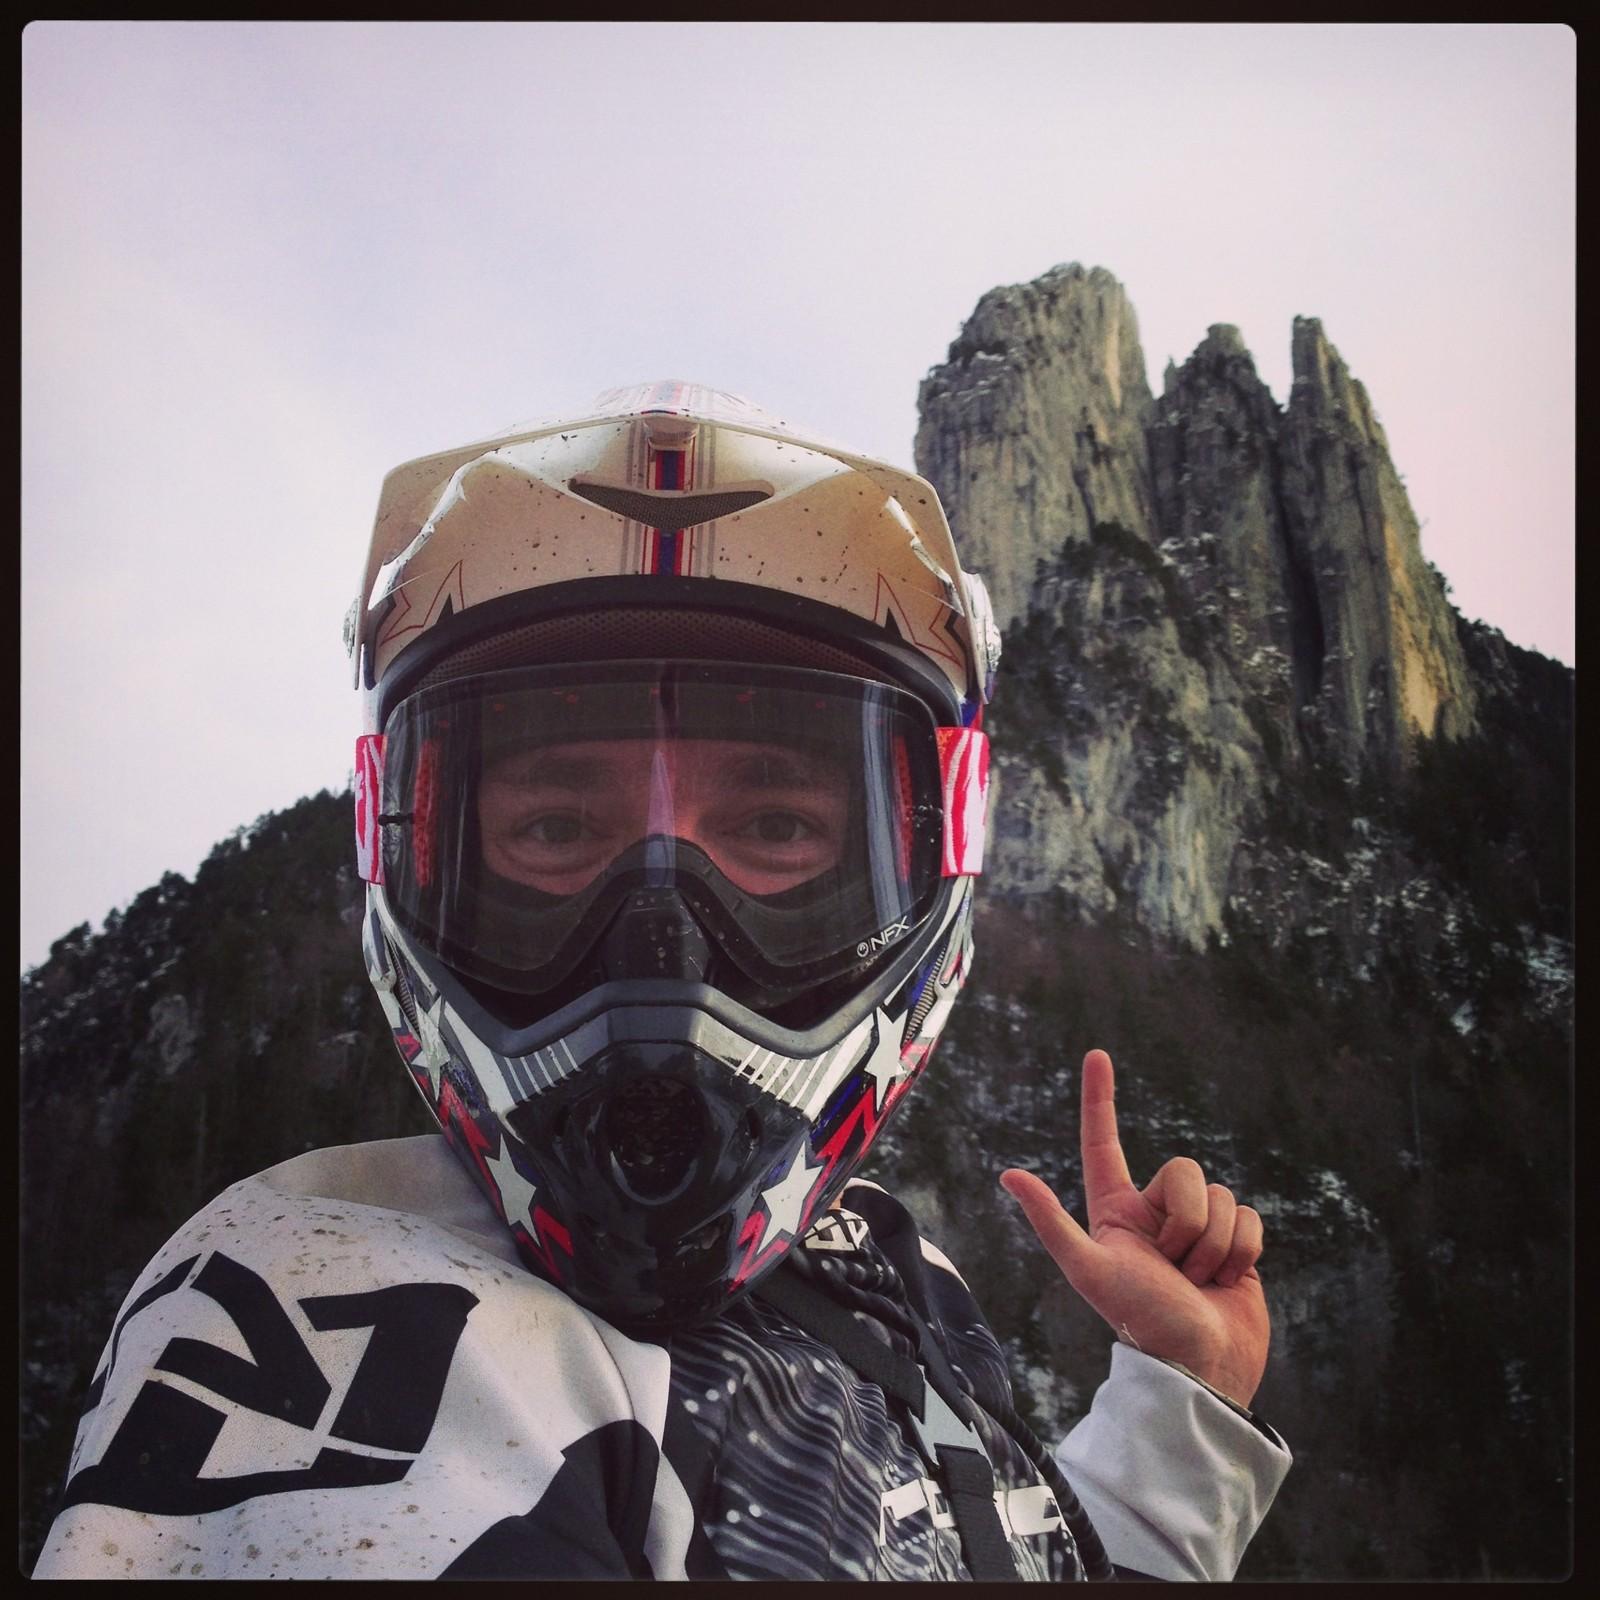 WE ! - gilles.pfeiffer - Mountain Biking Pictures - Vital MTB